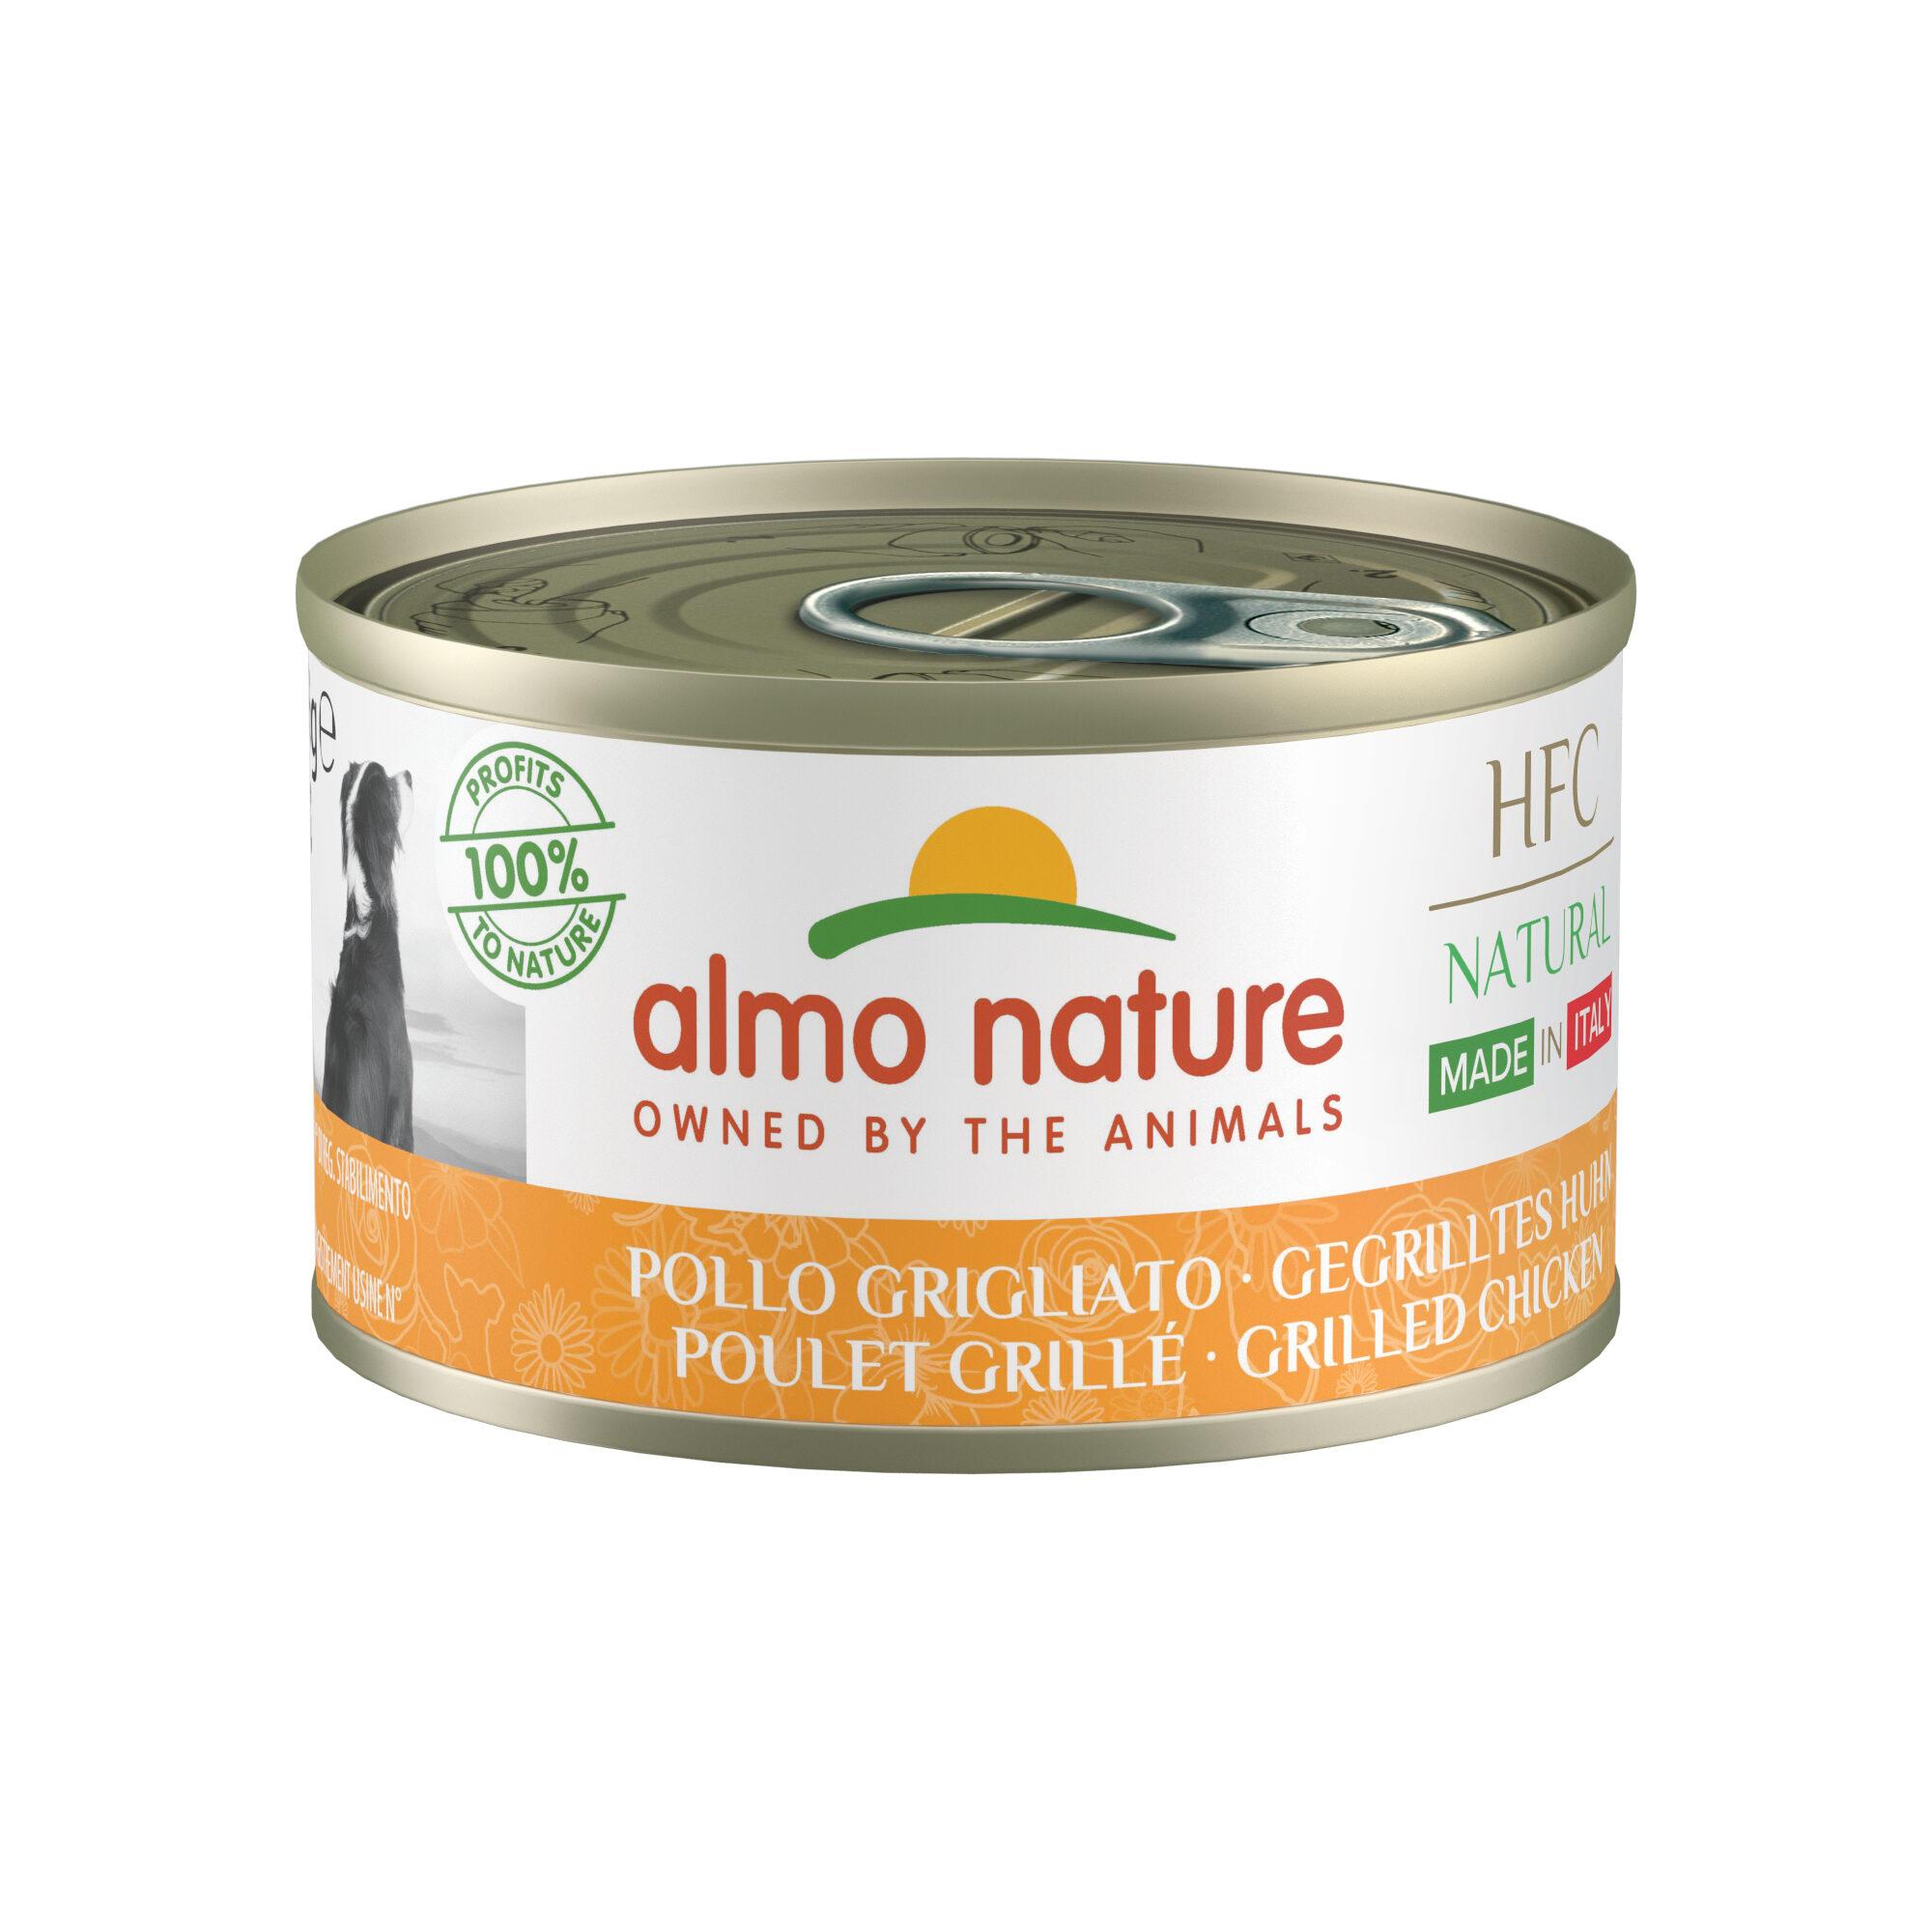 Almo Nature HFC Natural Made en Italy - Poulet grillé